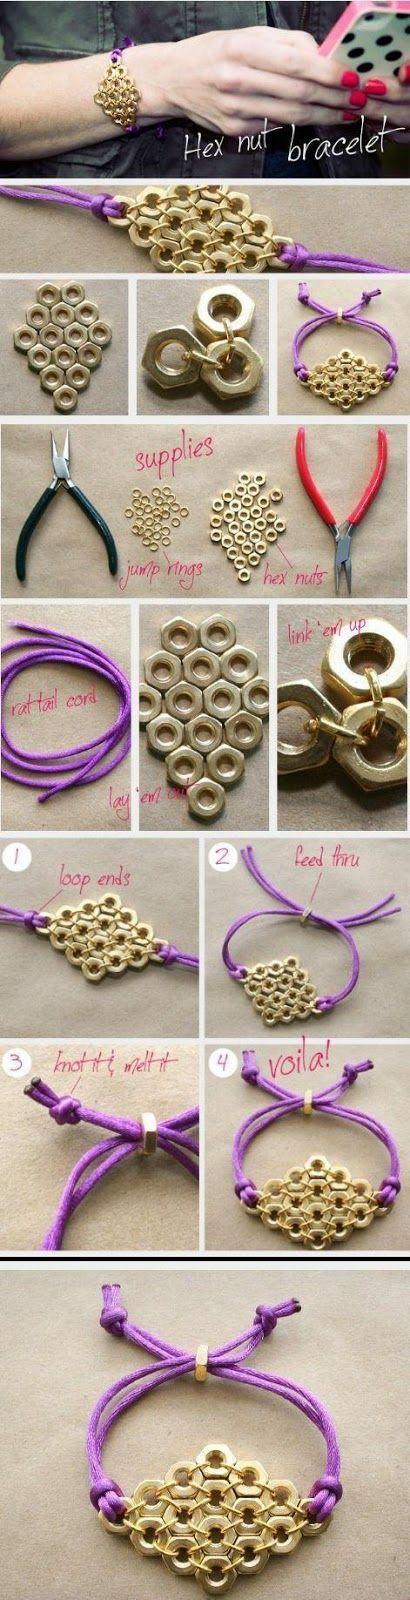 10 DIY pour raliser ses propres bijoux